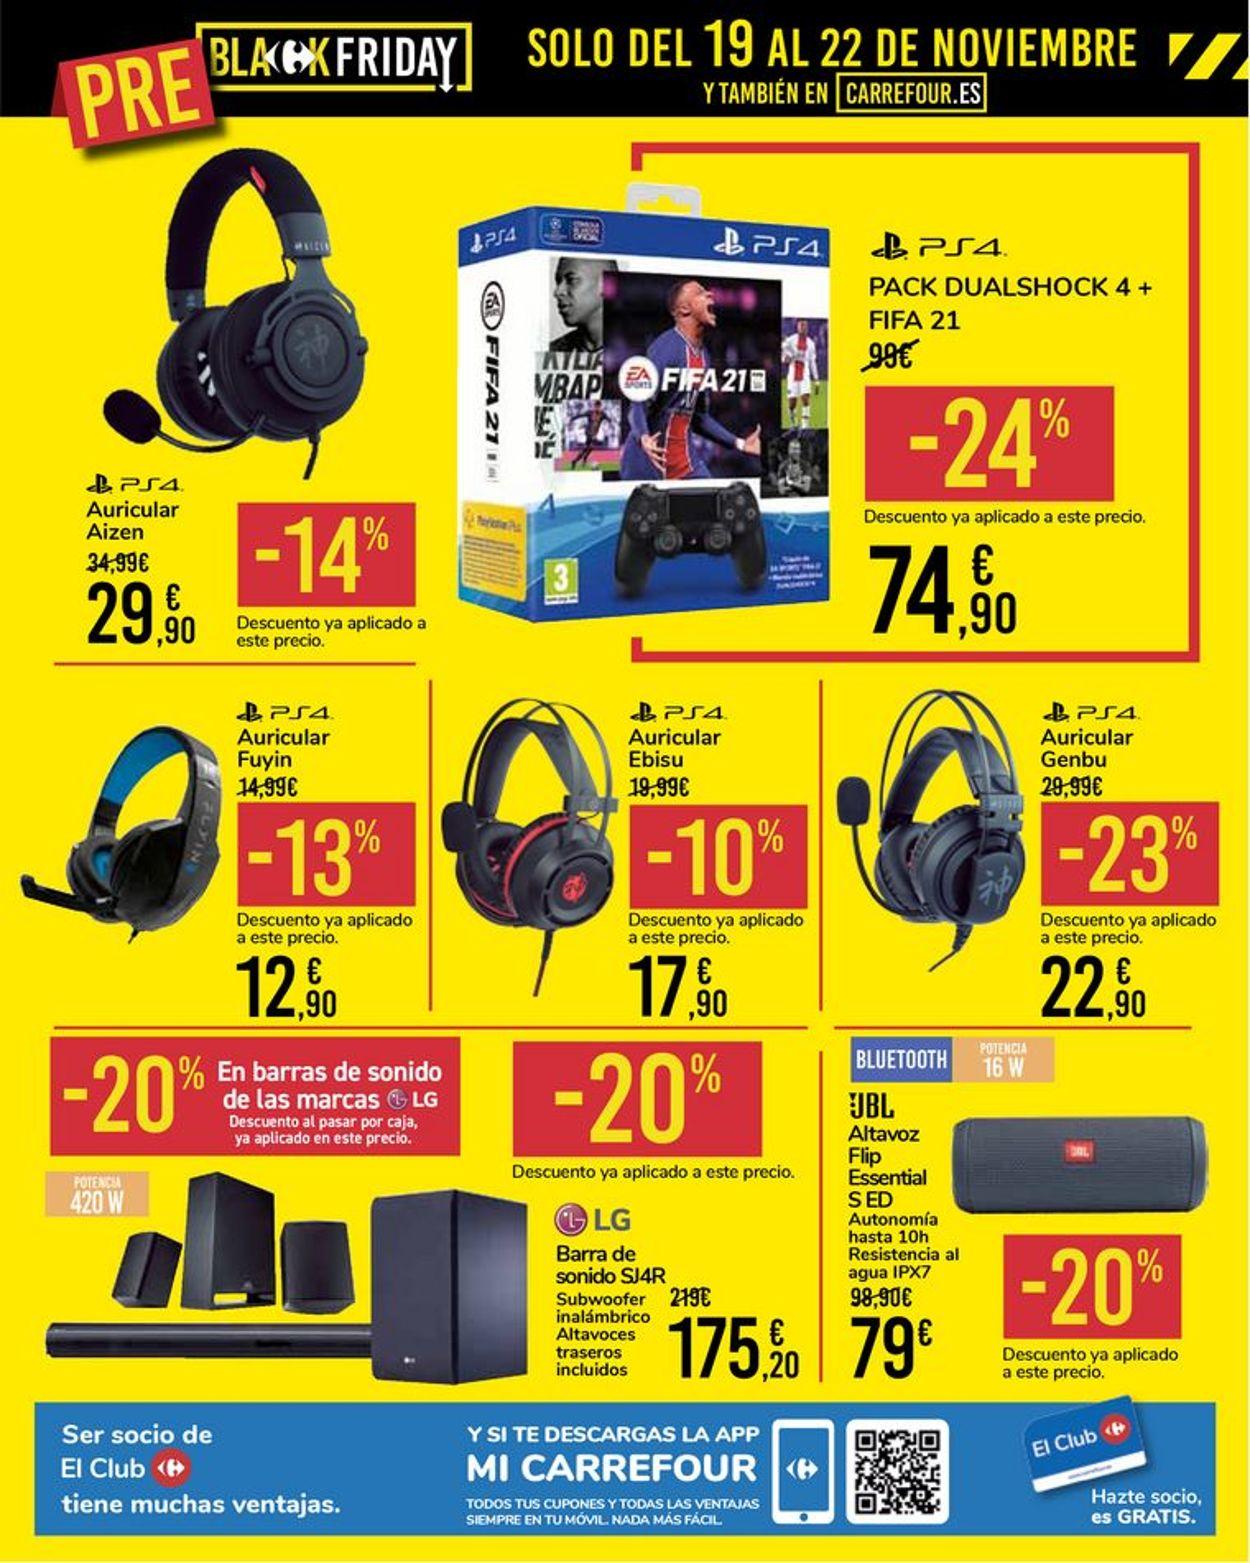 Carrefour - Pre-Black Friday 2020 Folleto - 16.11-22.11.2020 (Página 12)